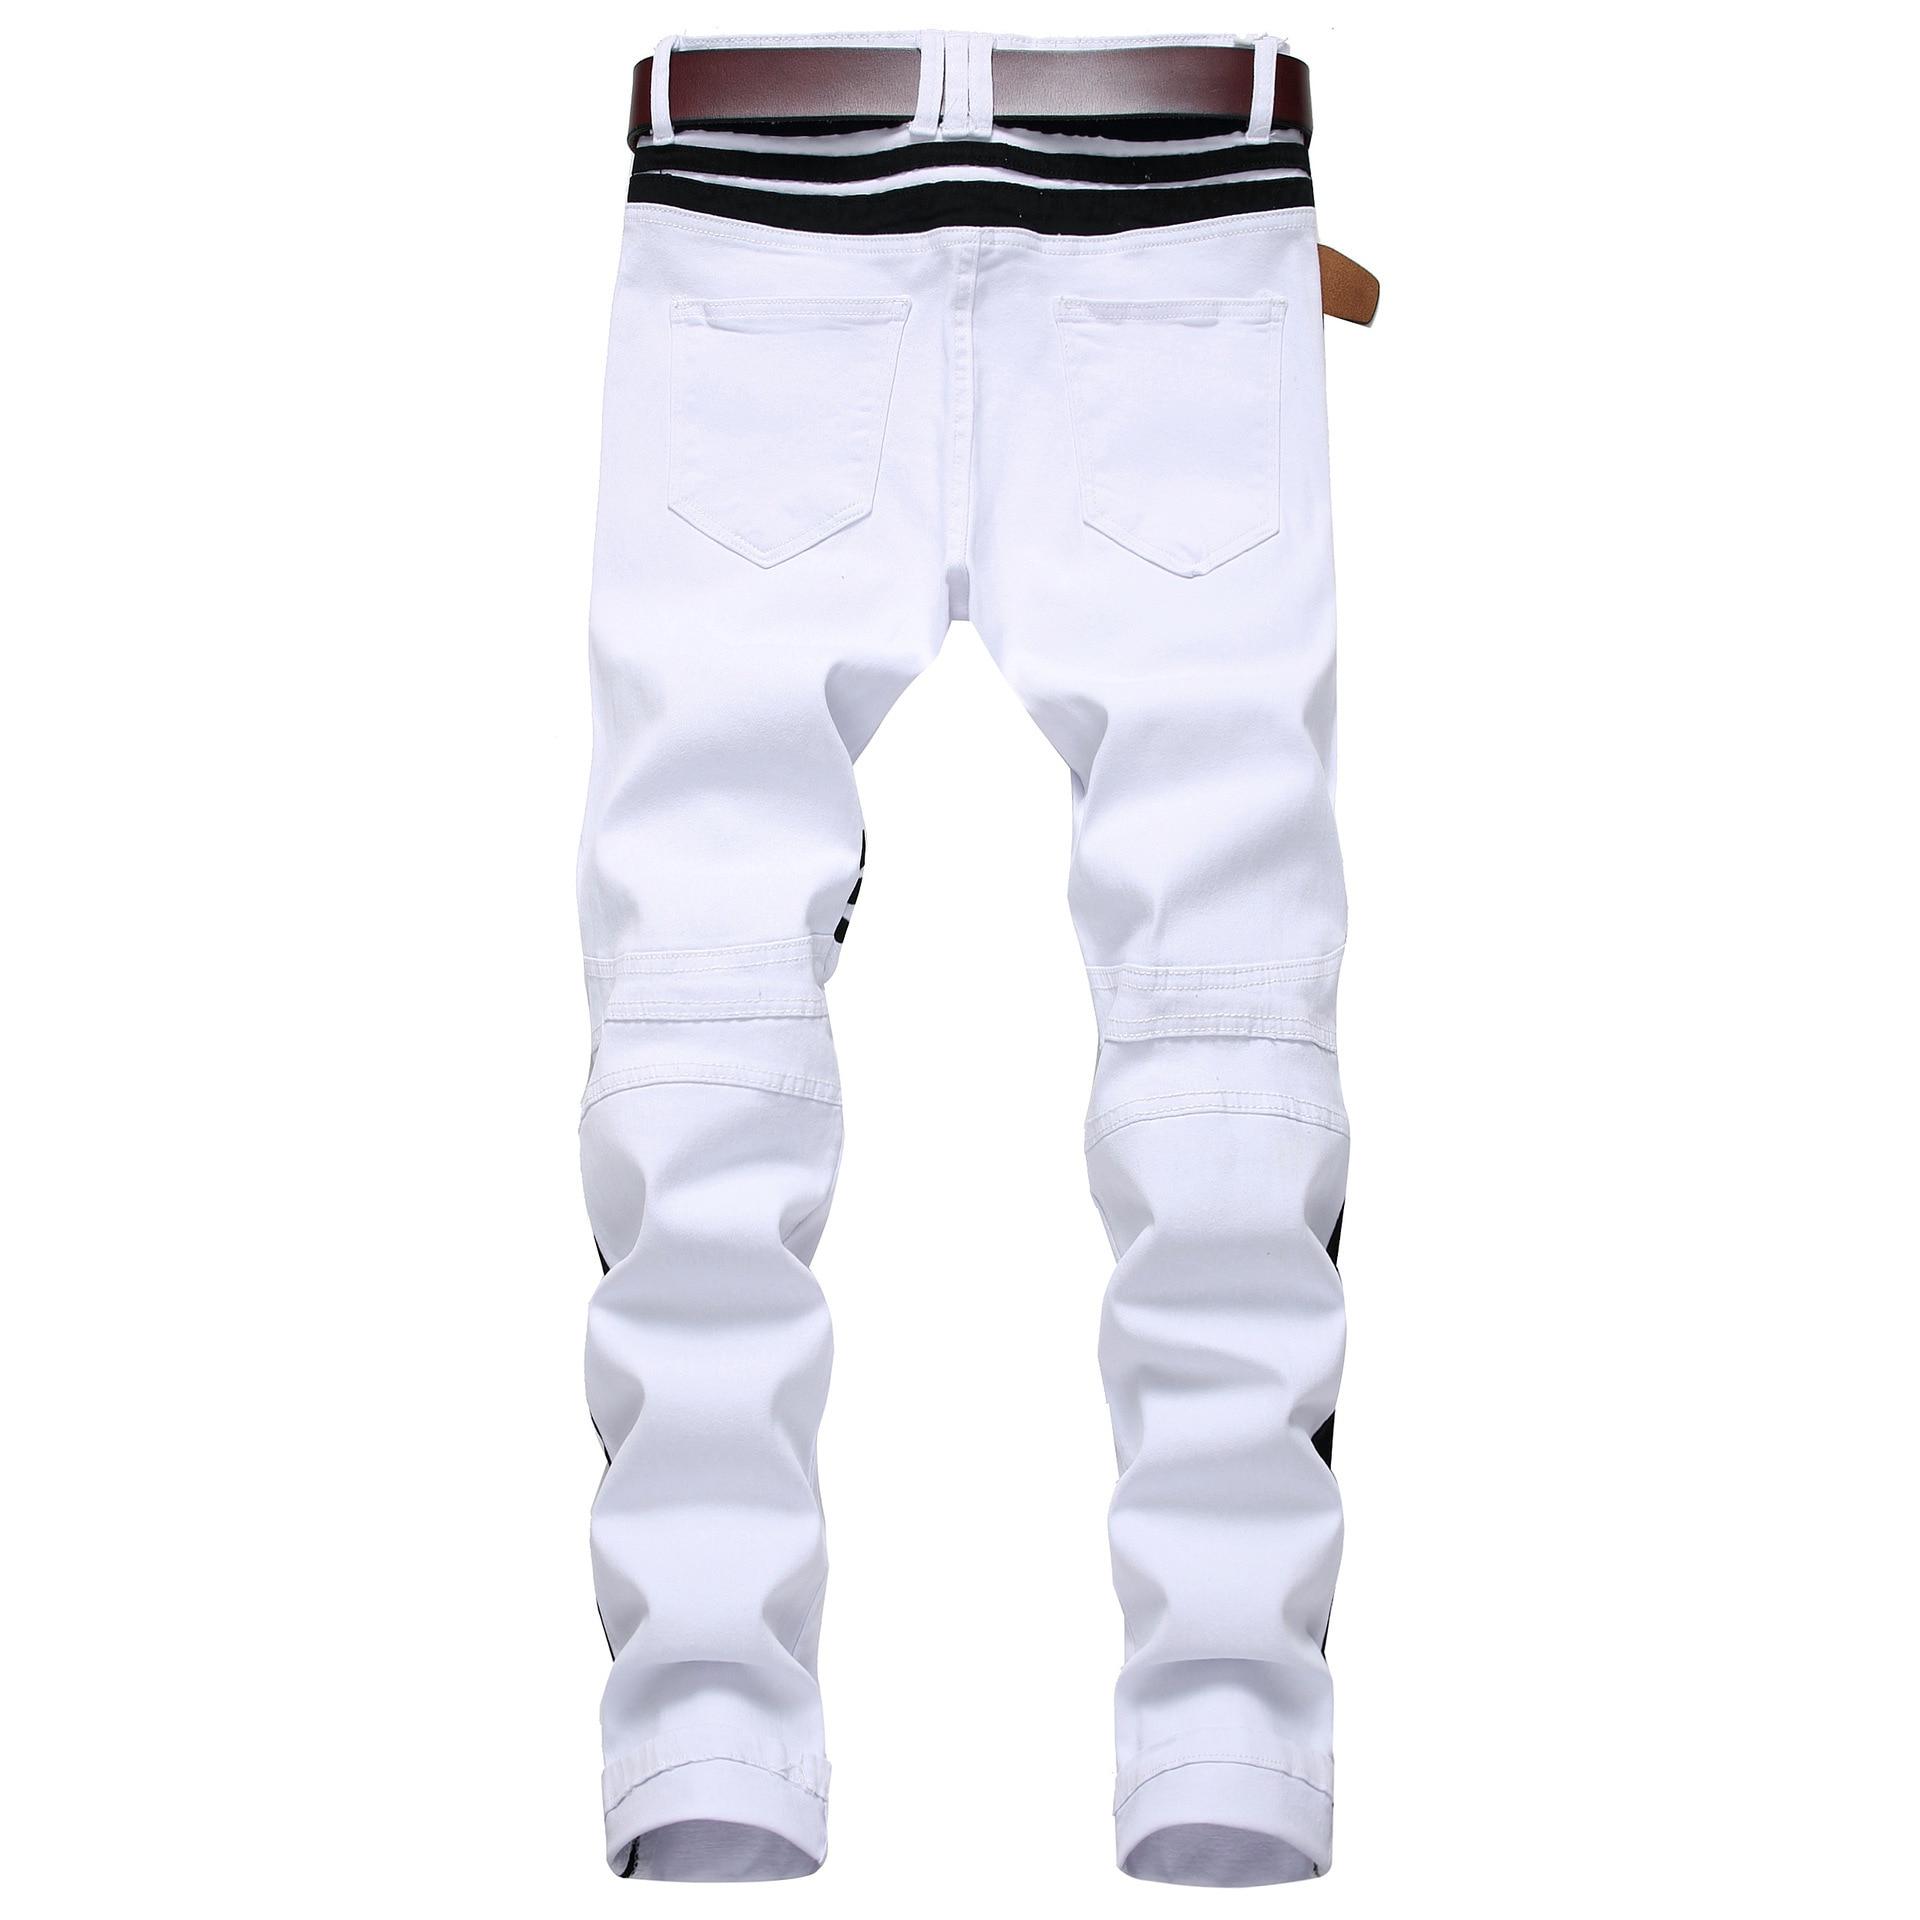 Men White Zipper Jeans Black Edge Decoration Pin Tiao Slim Fit Elasticity With Holes MEN'S Casual Trousers